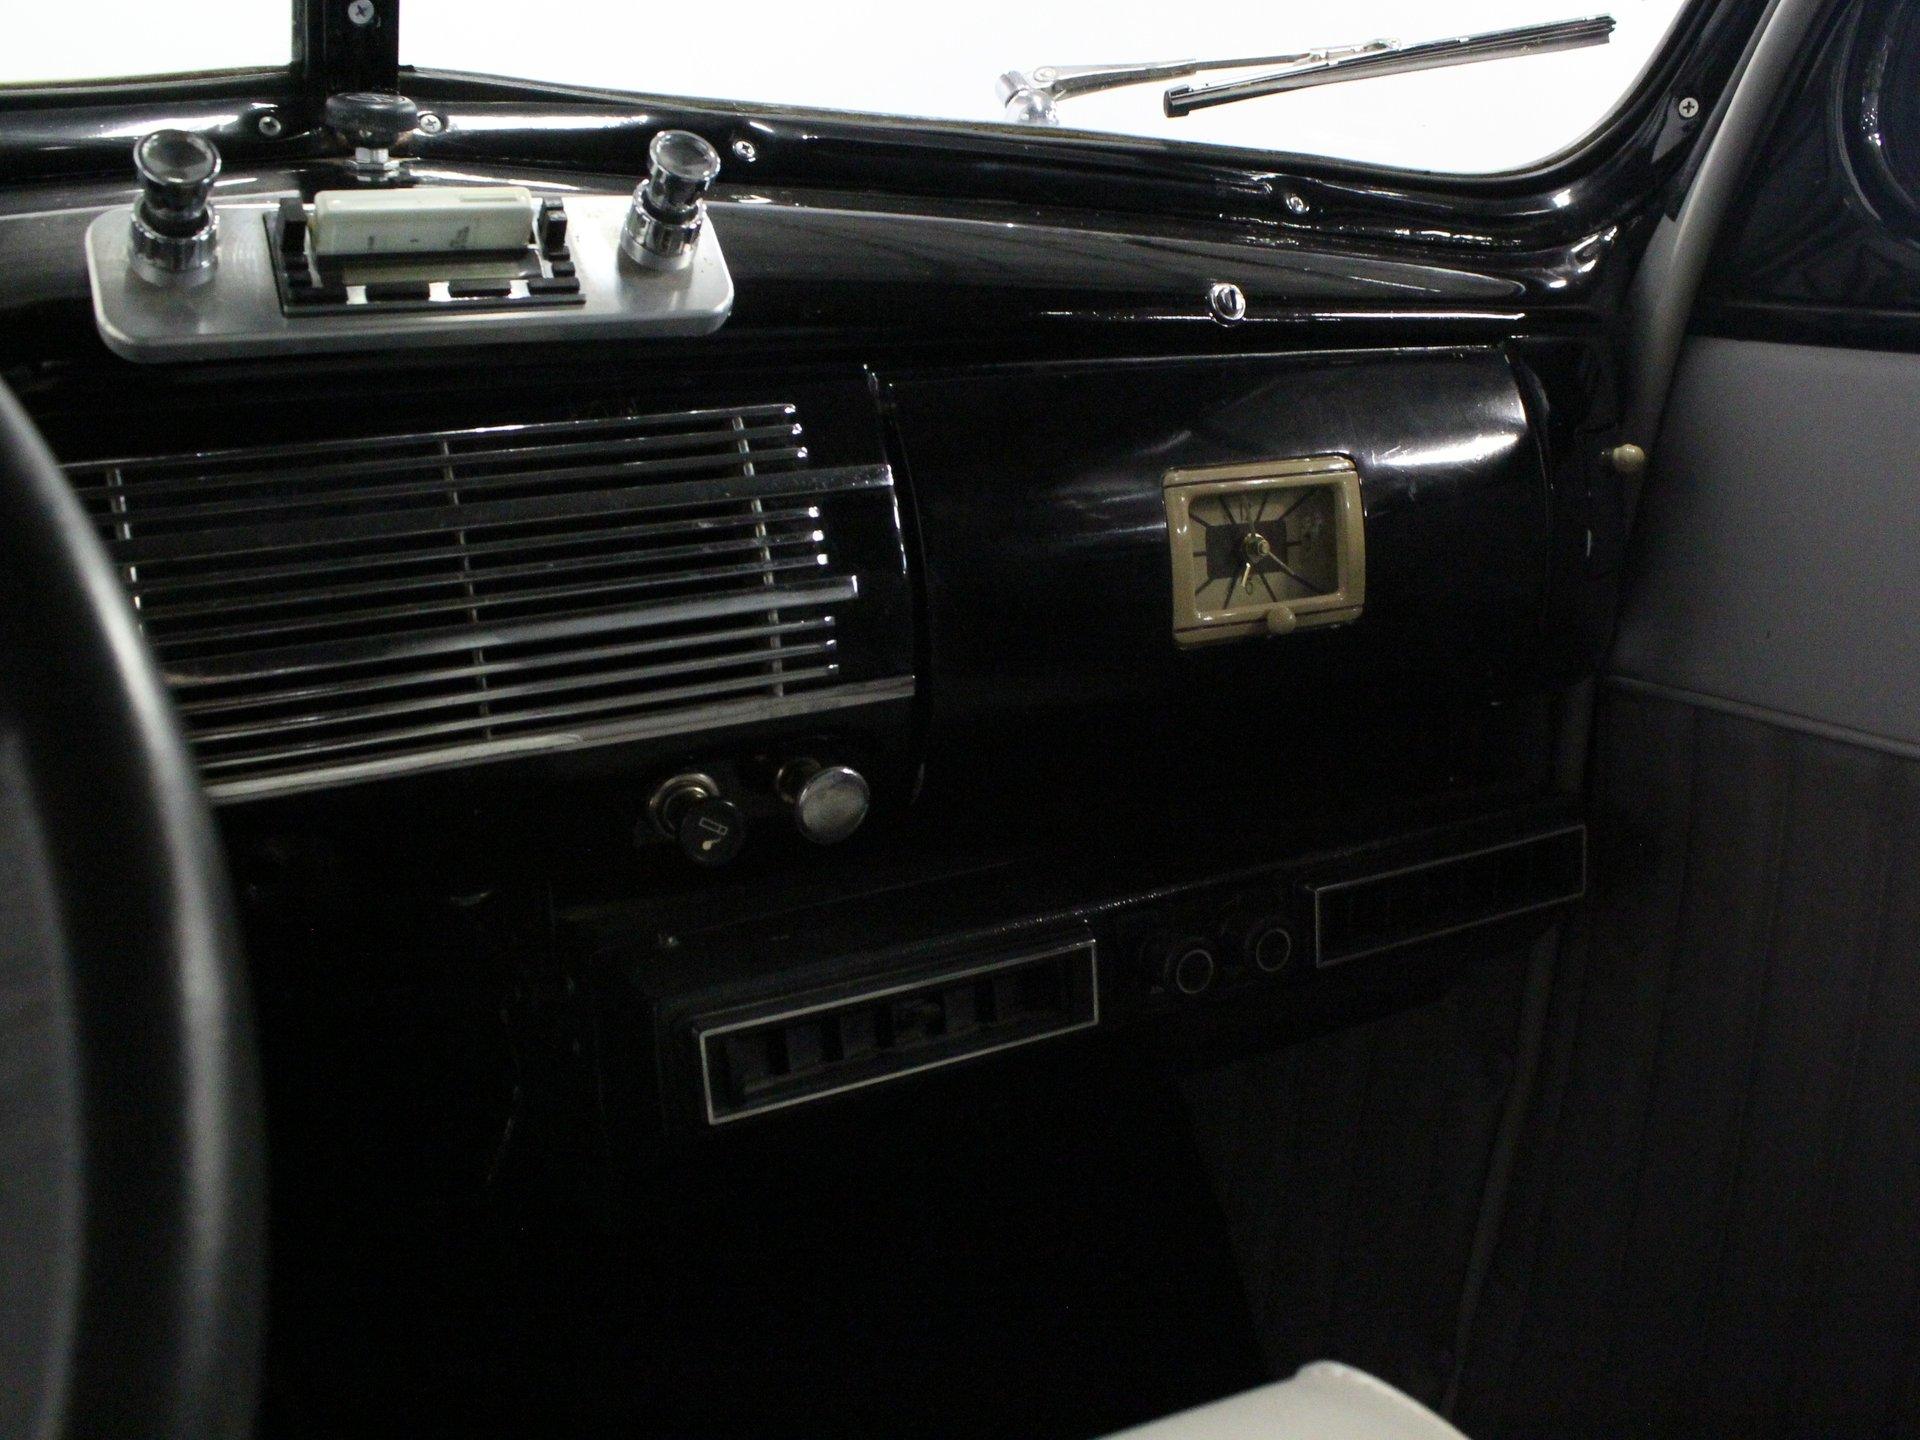 1940 Ford Sedan Delivery | Streetside Classics - The